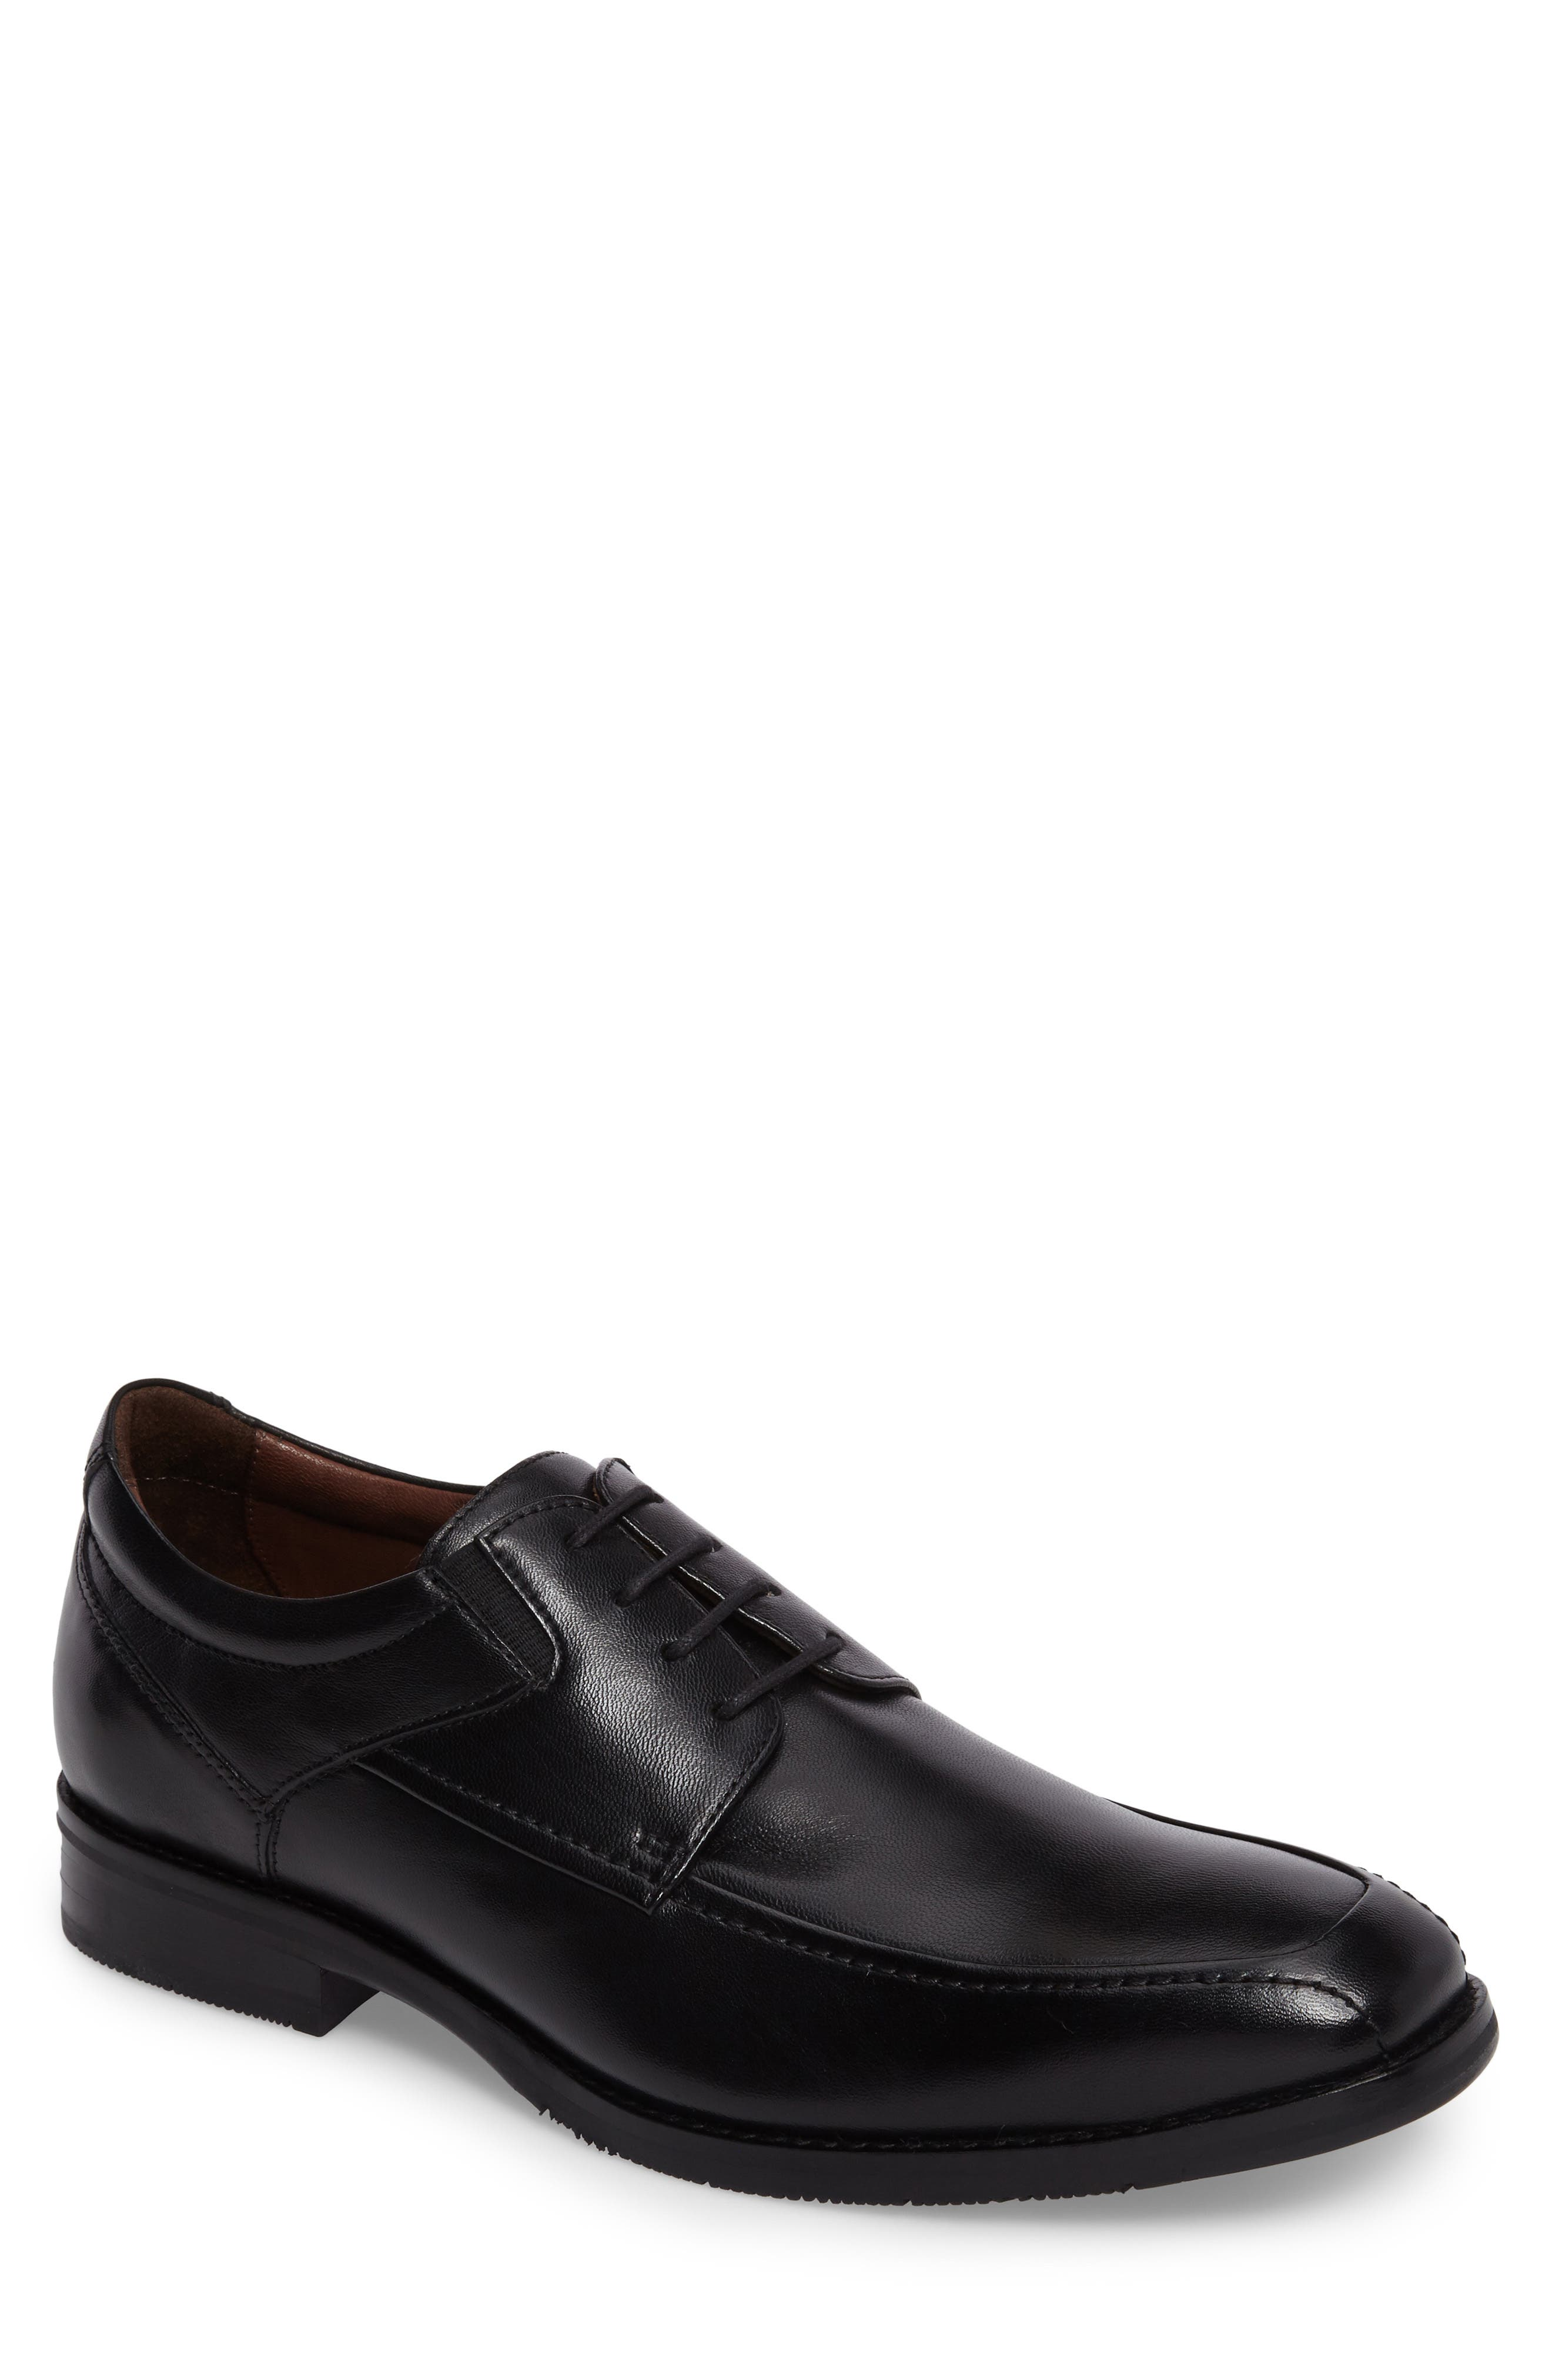 Apron Toe Derby,                         Main,                         color, Black